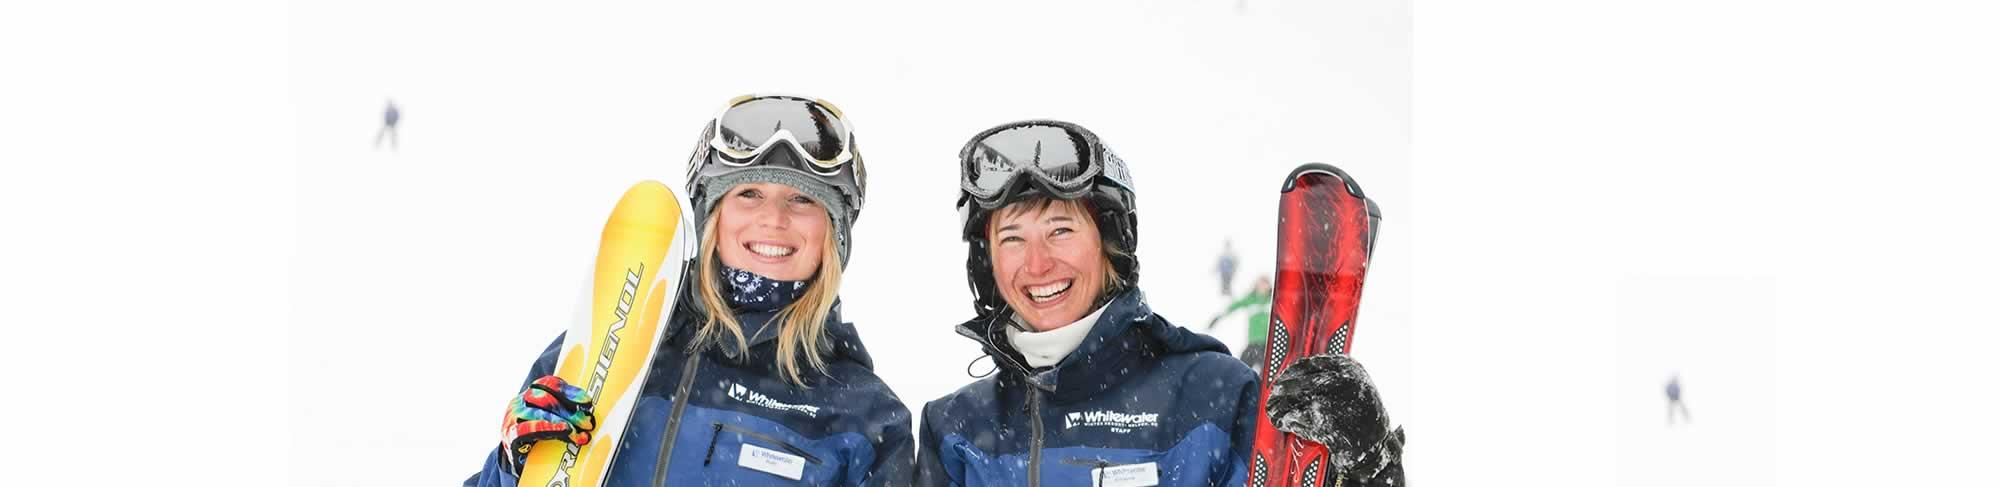 Alpine motel & Whitewater Ski Resort in Nelson BC Canada